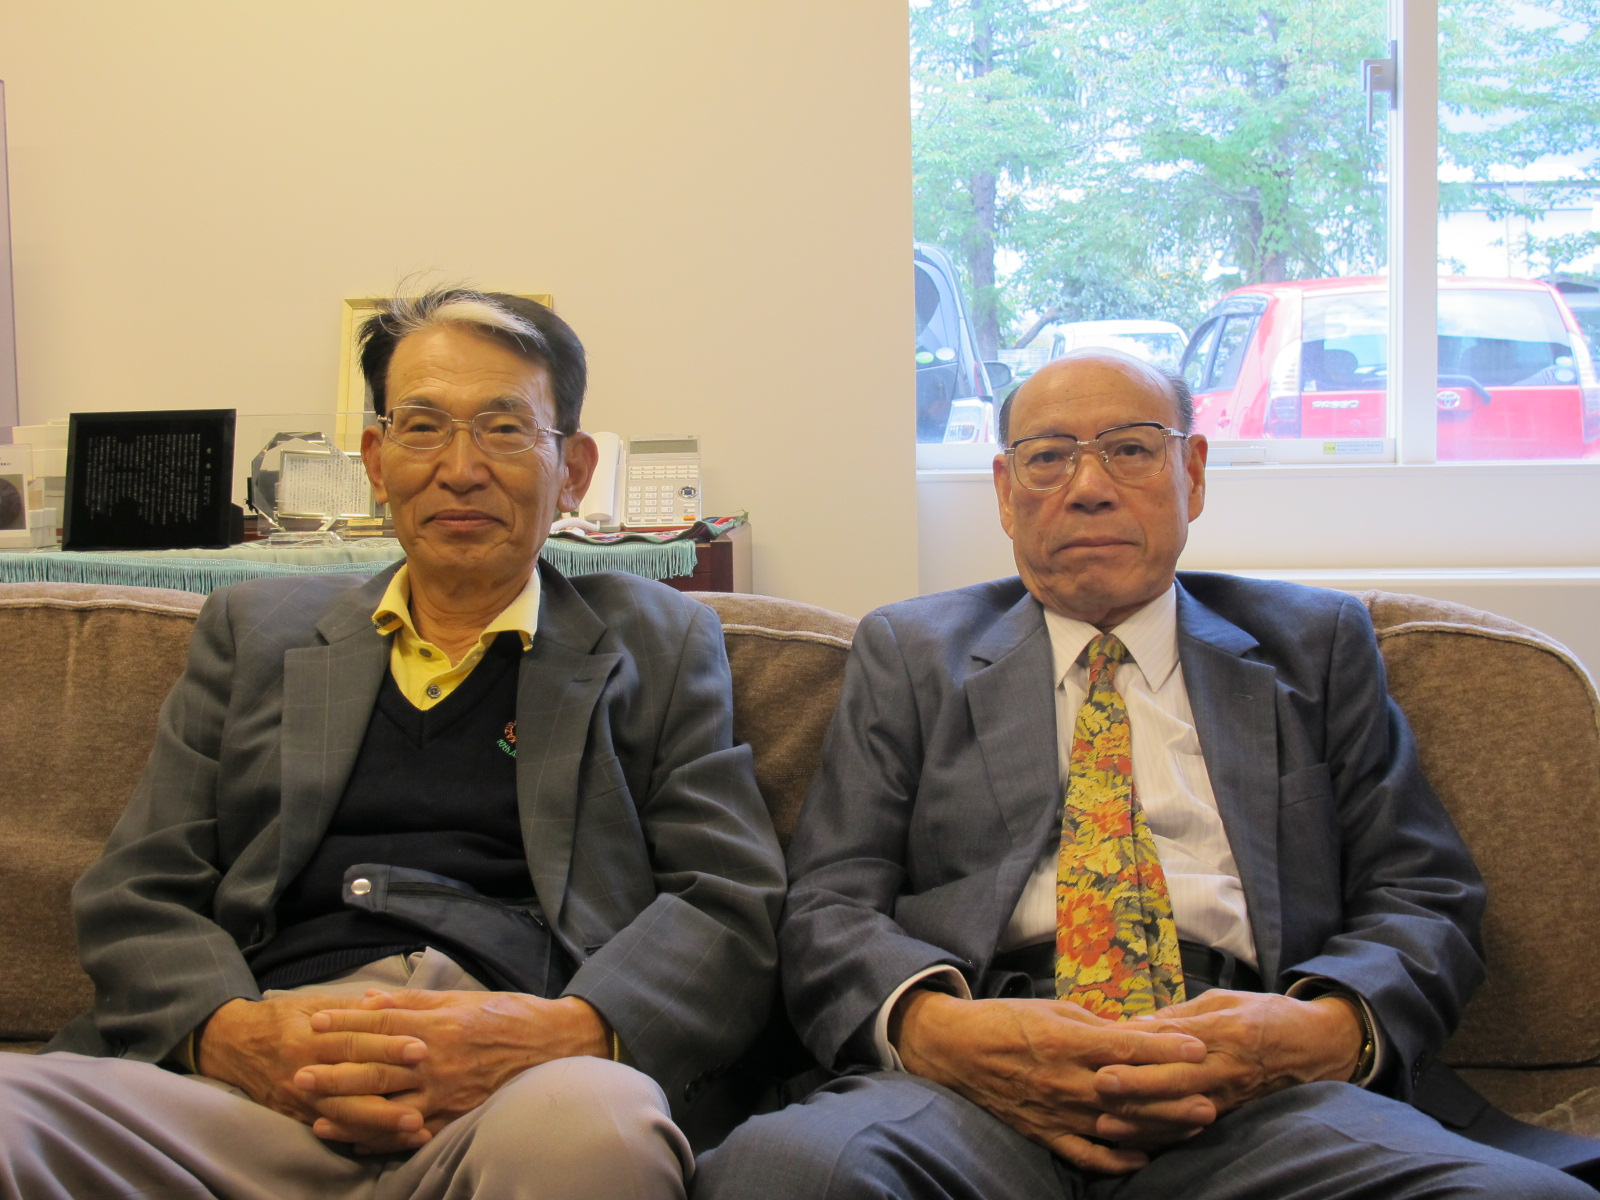 江辺純三(M32)先輩と藤倉嘉昭名誉教授(T32)が来訪_c0075701_12462516.jpg